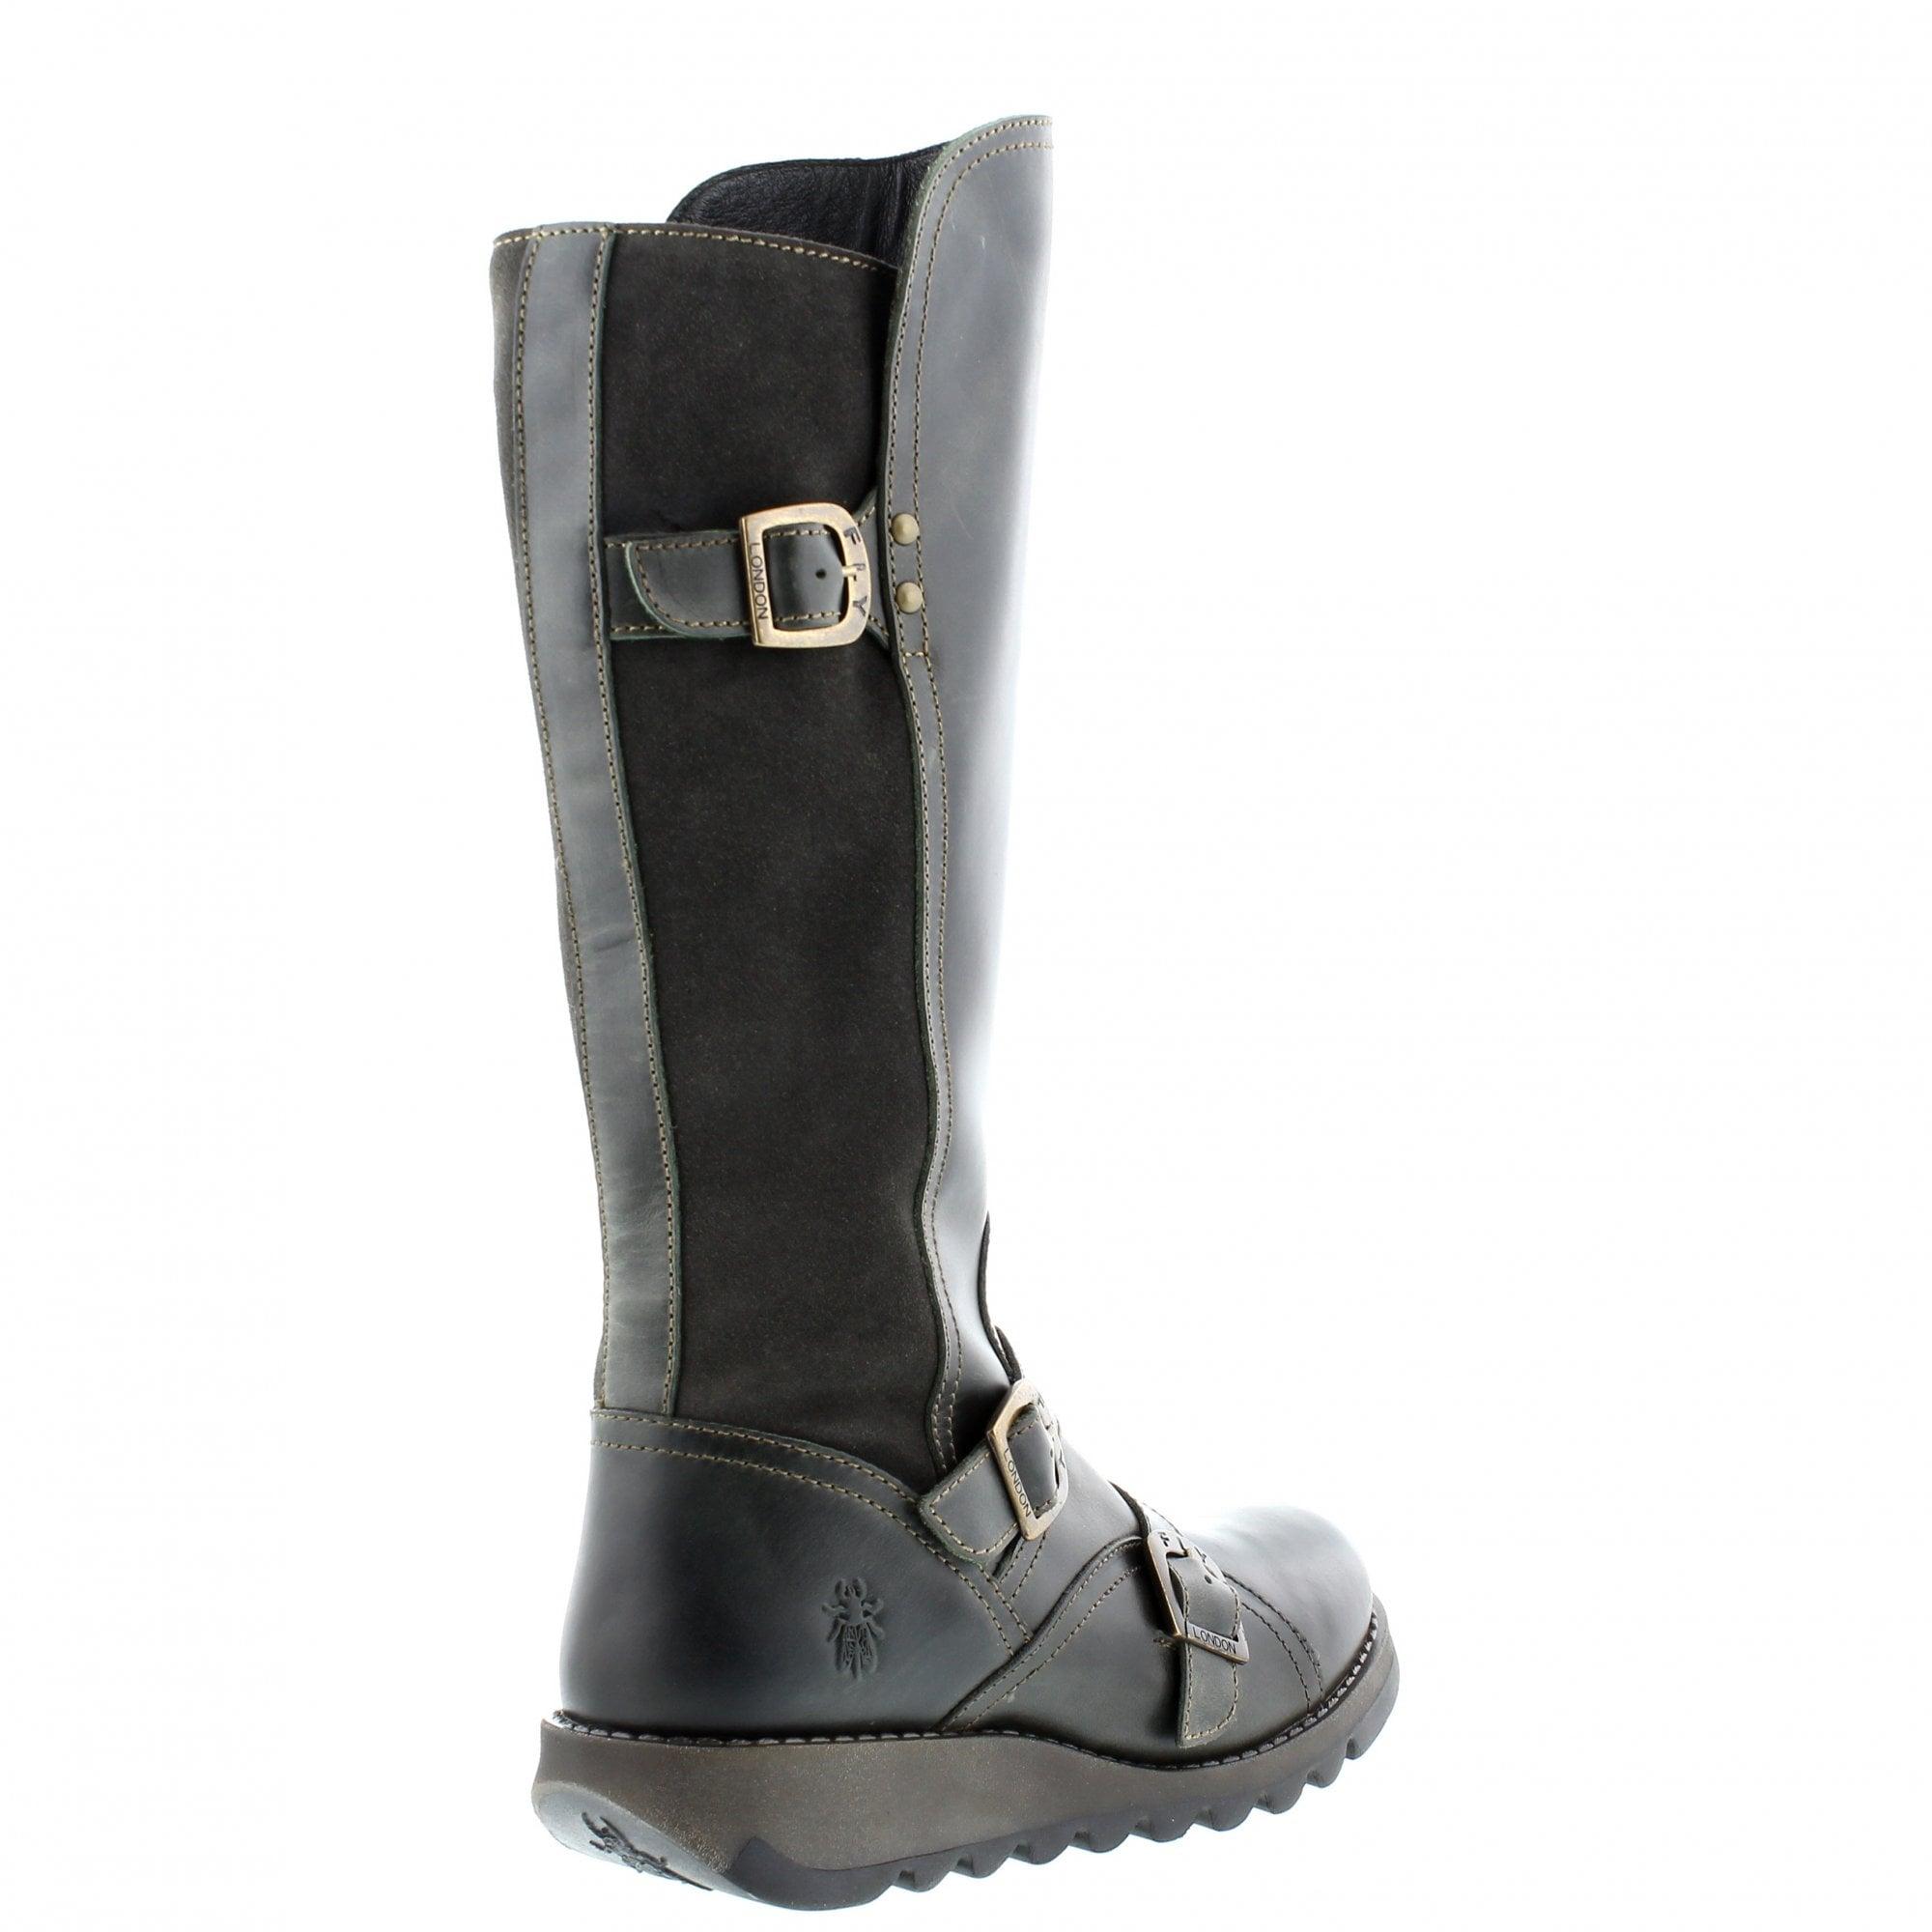 8e09c301fd1 Fly Suda 144361-003 Knee High Boots